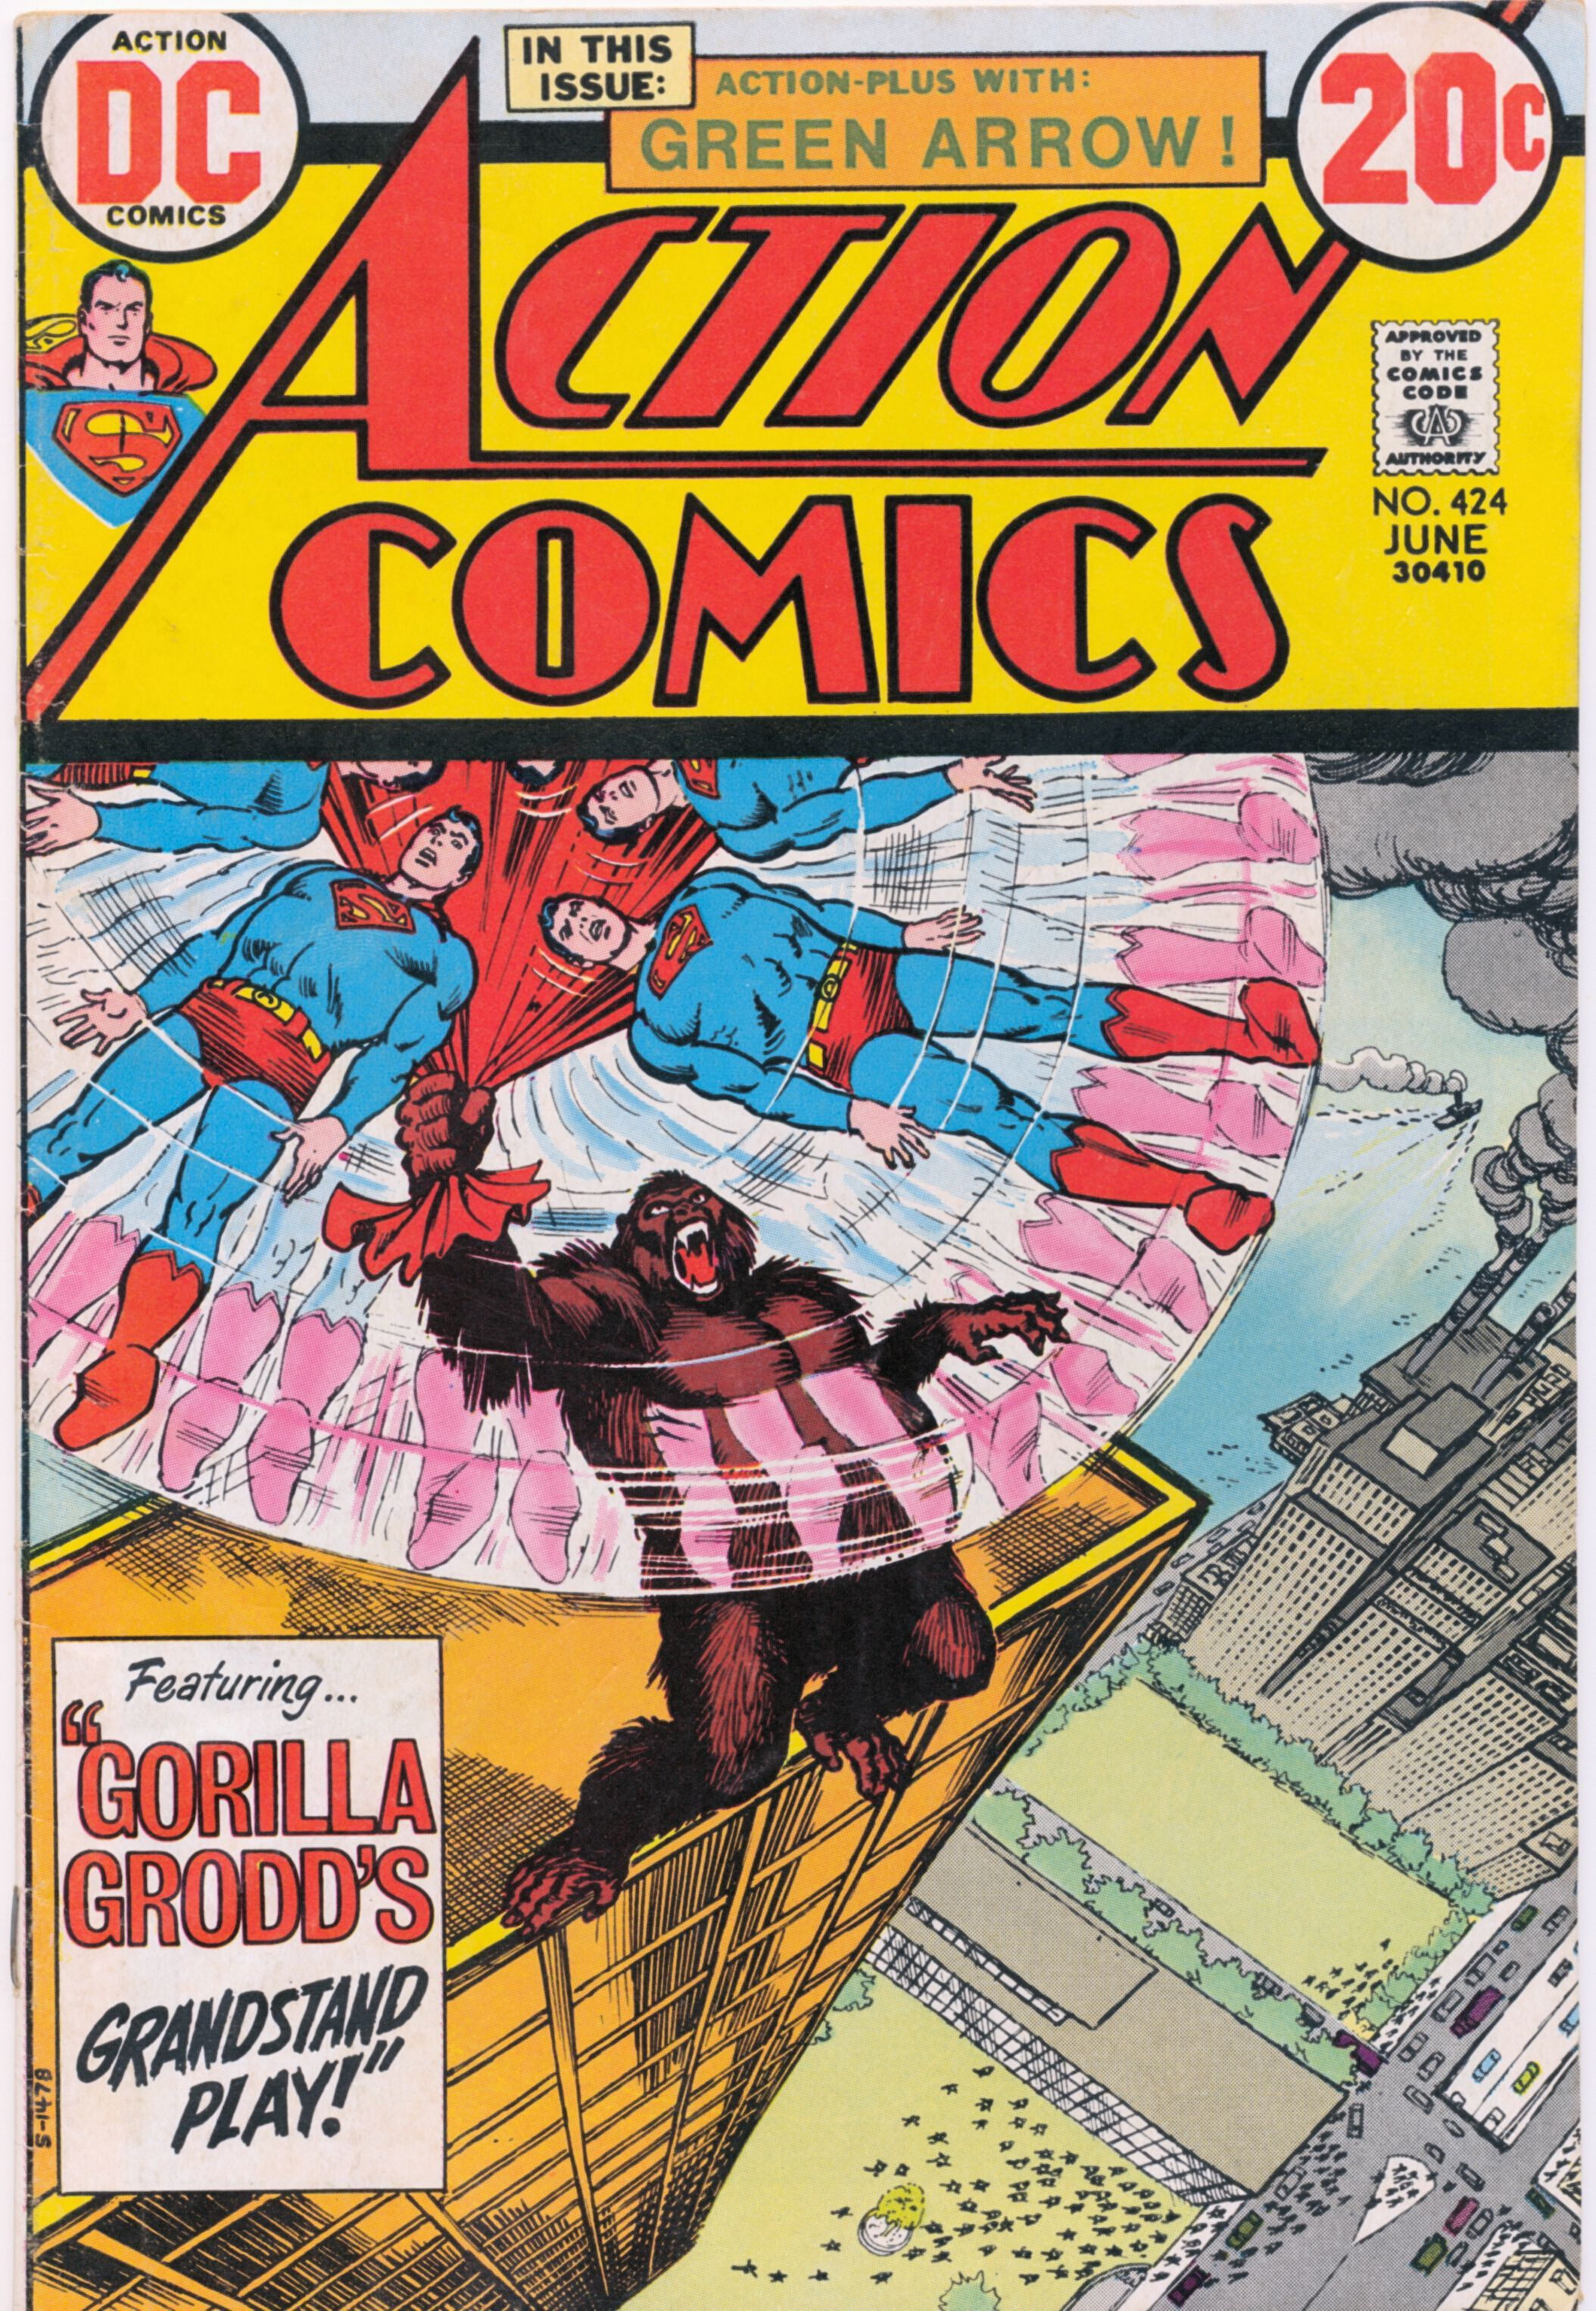 Action comics no 424 june 1973 with images comics